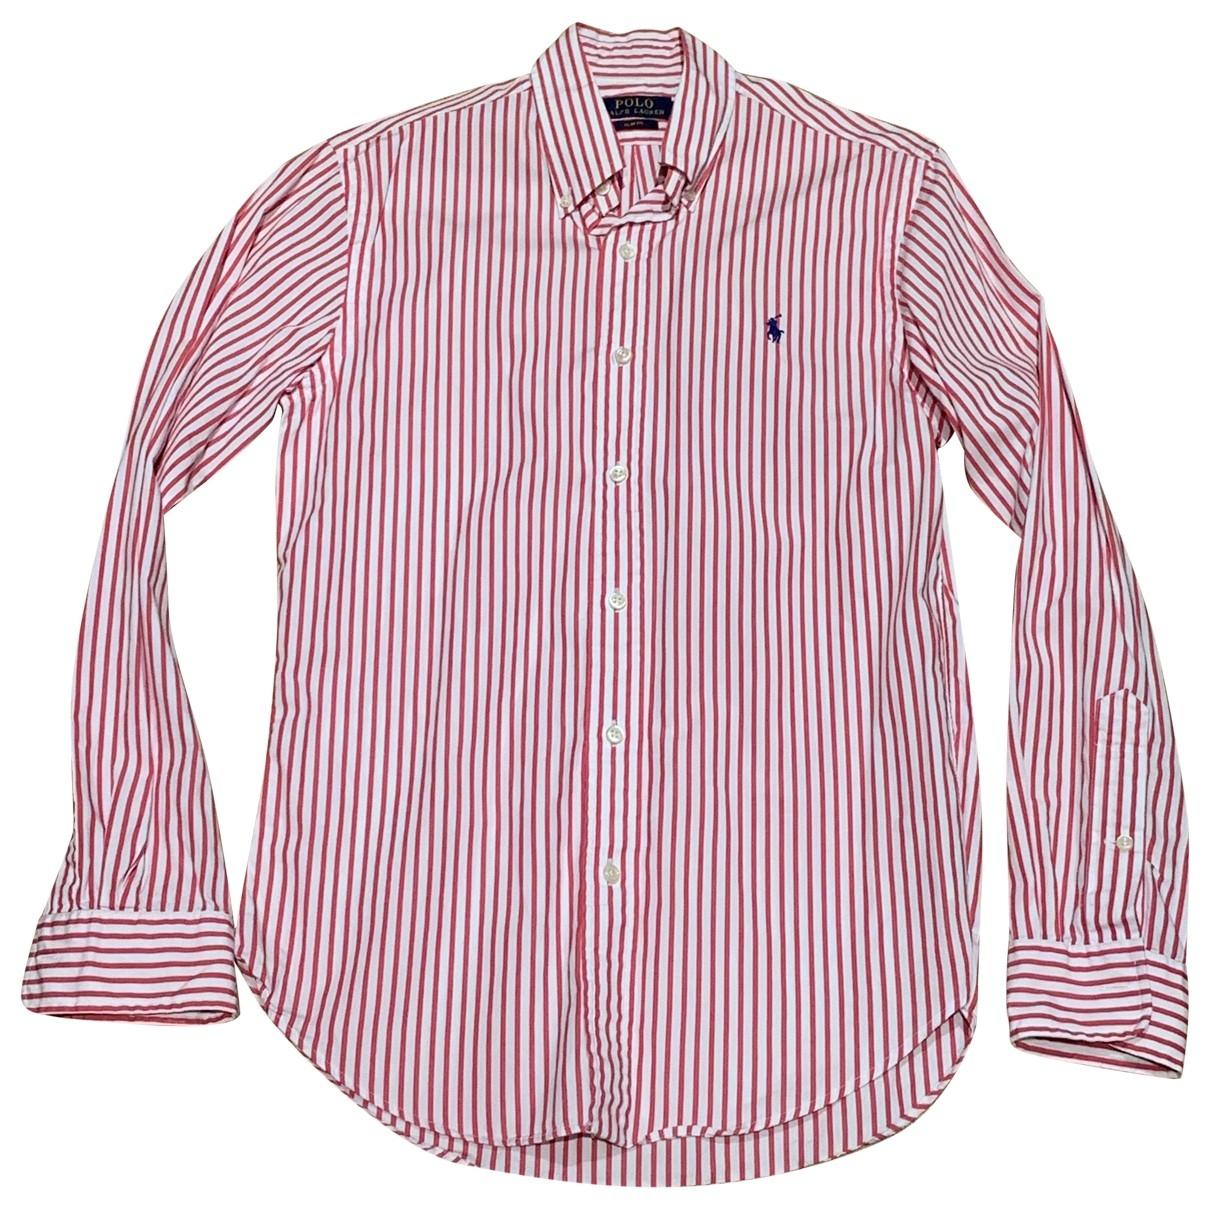 Polo Ralph Lauren \N Multicolour Cotton Shirts for Men S International